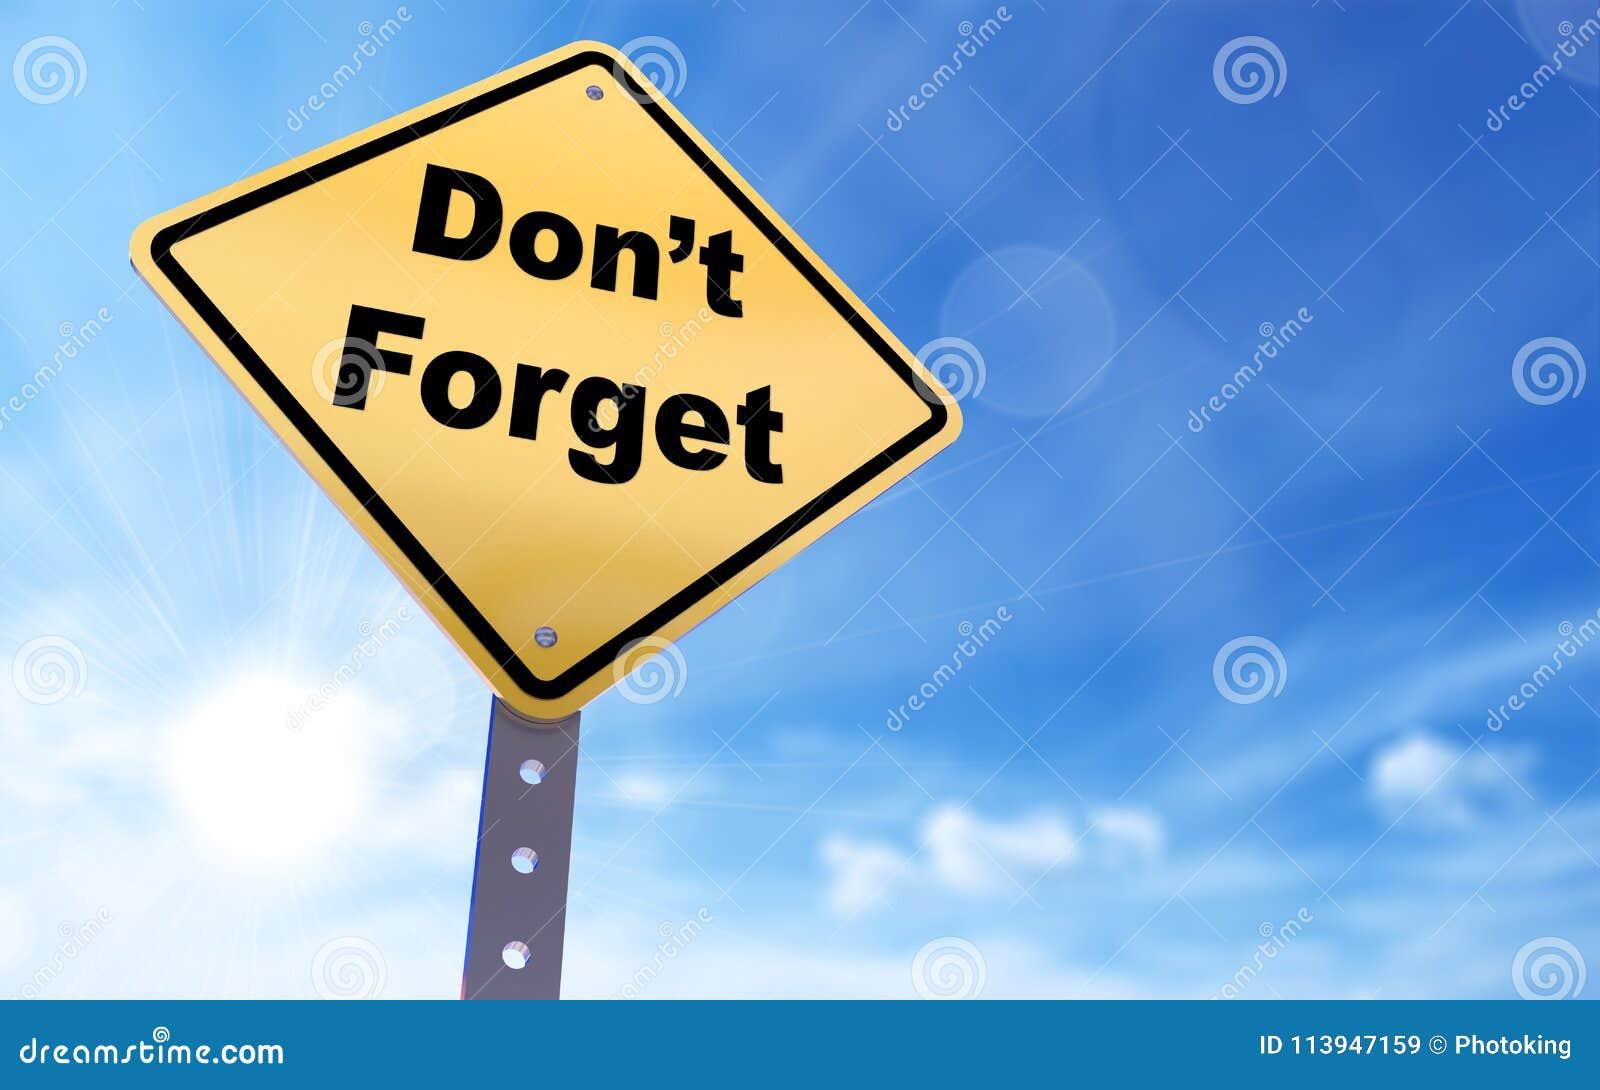 don-t-forget-sign-don-t-forget-sign-blue-sky-background-d-rendered-113947159.jpg